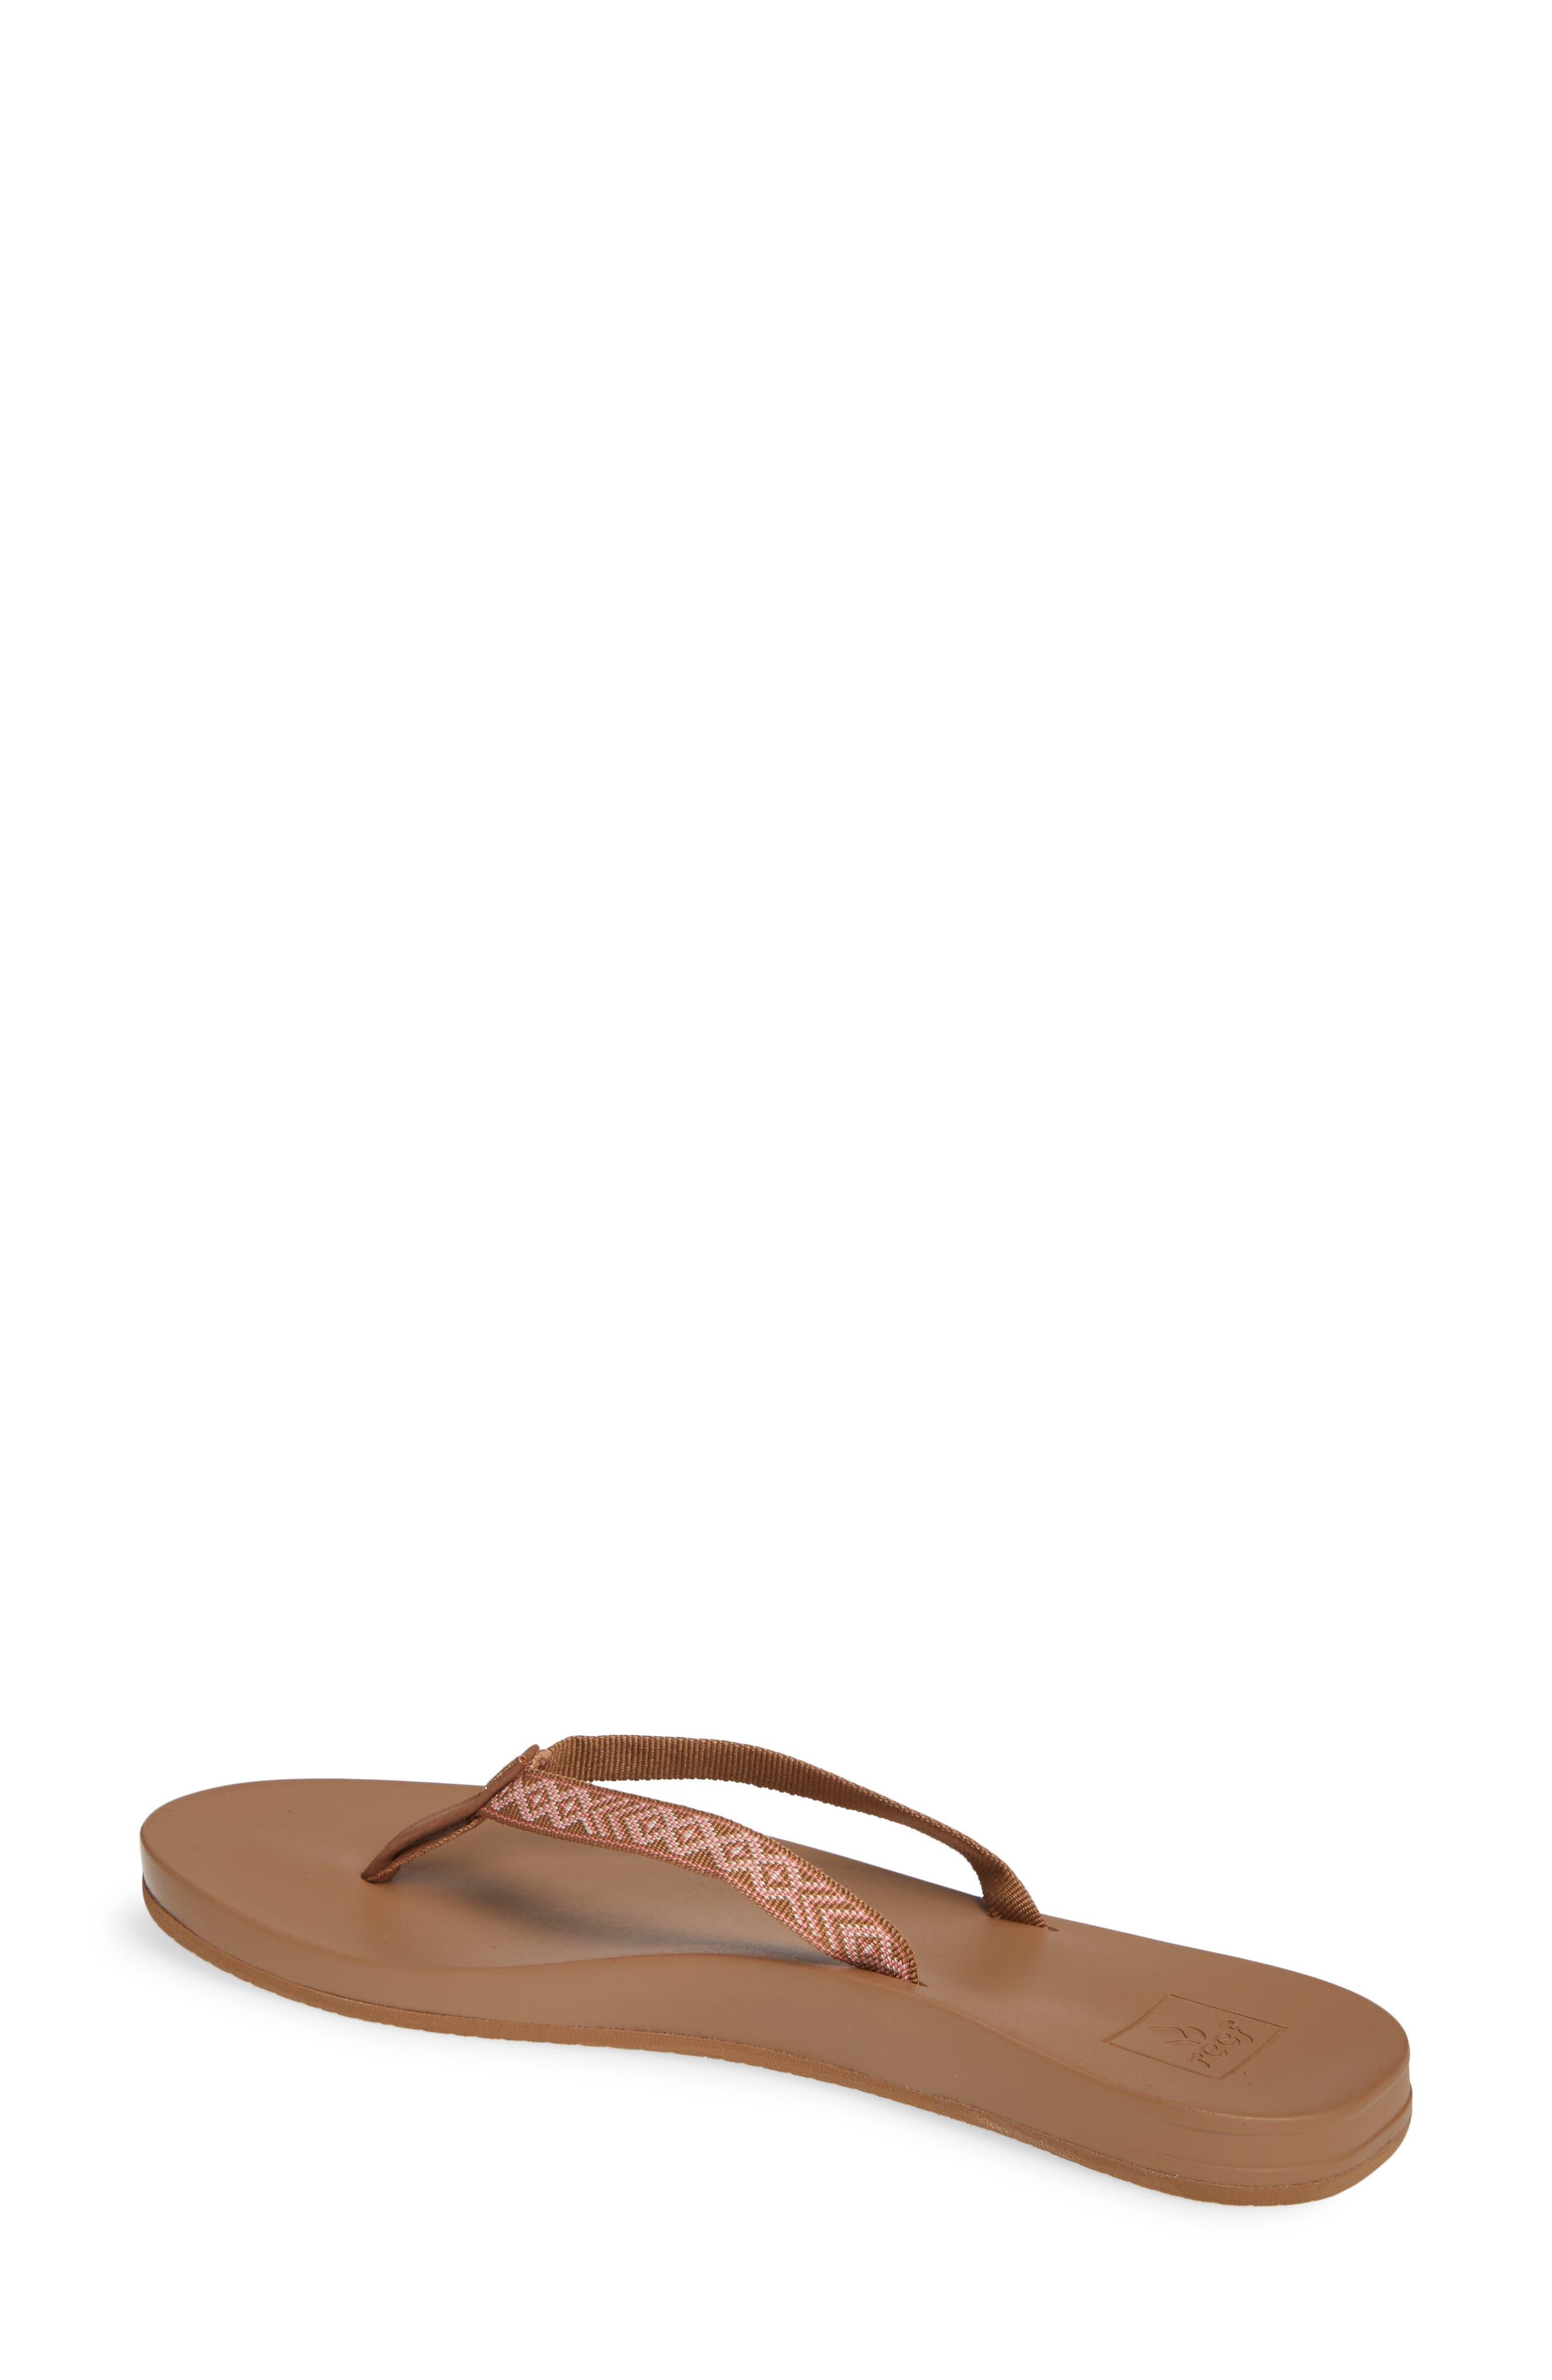 99fef45eb1 Women's Reef Sandals | Nordstrom